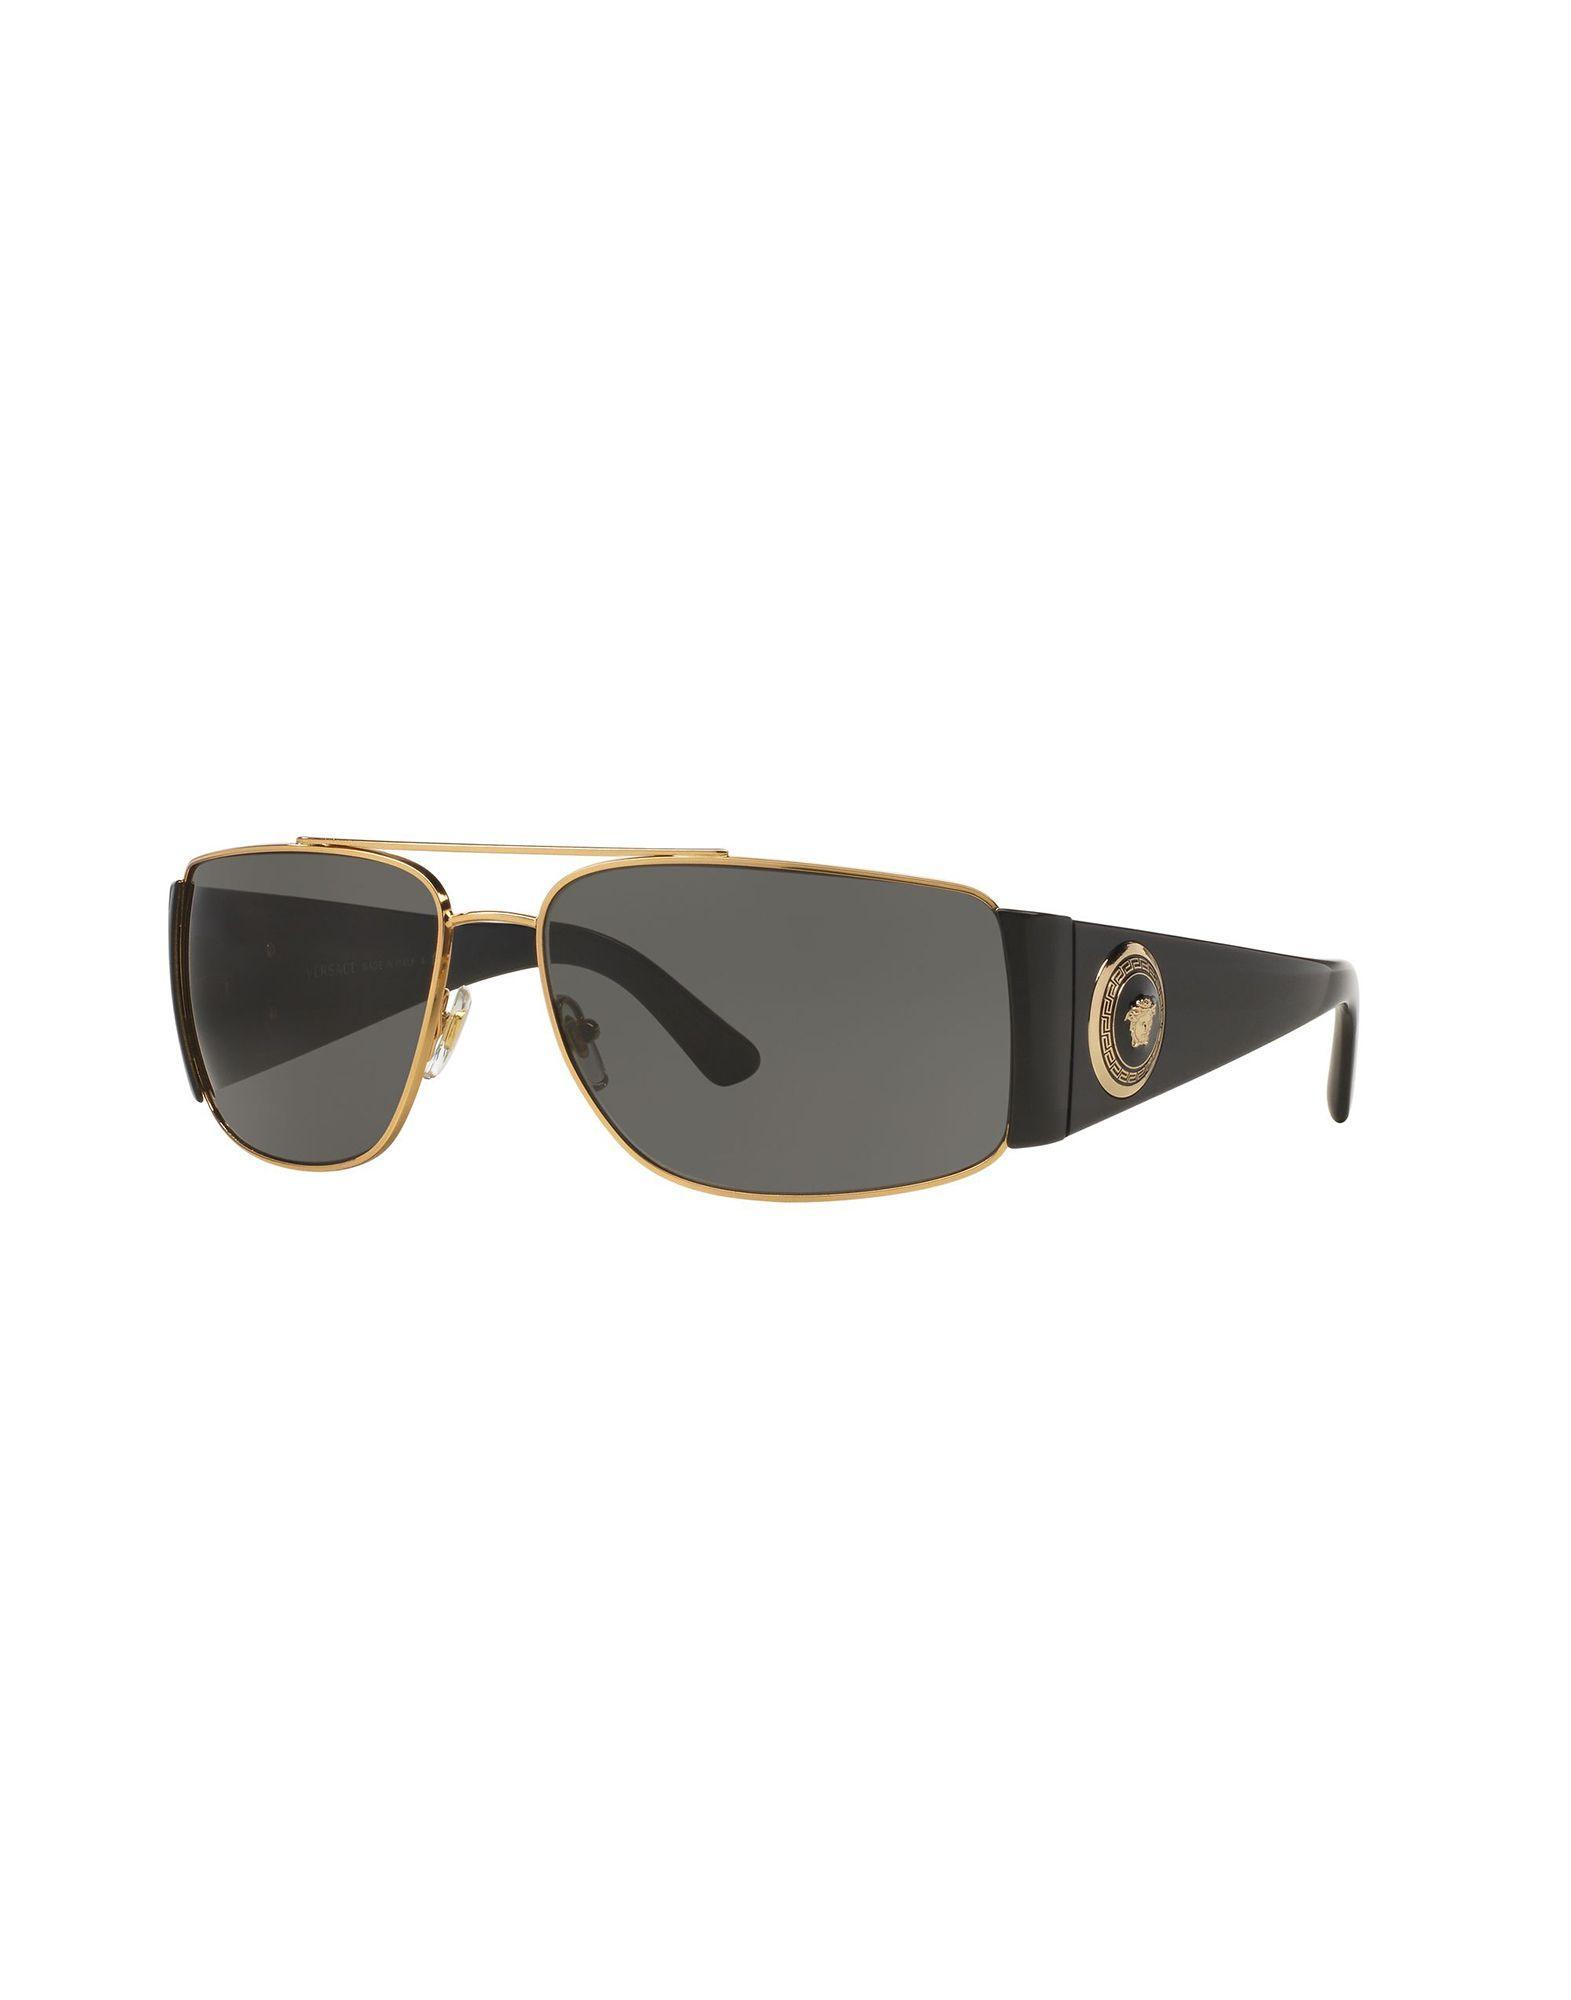 9b661ffabf7a Lyst - Versace Sunglasses in Metallic